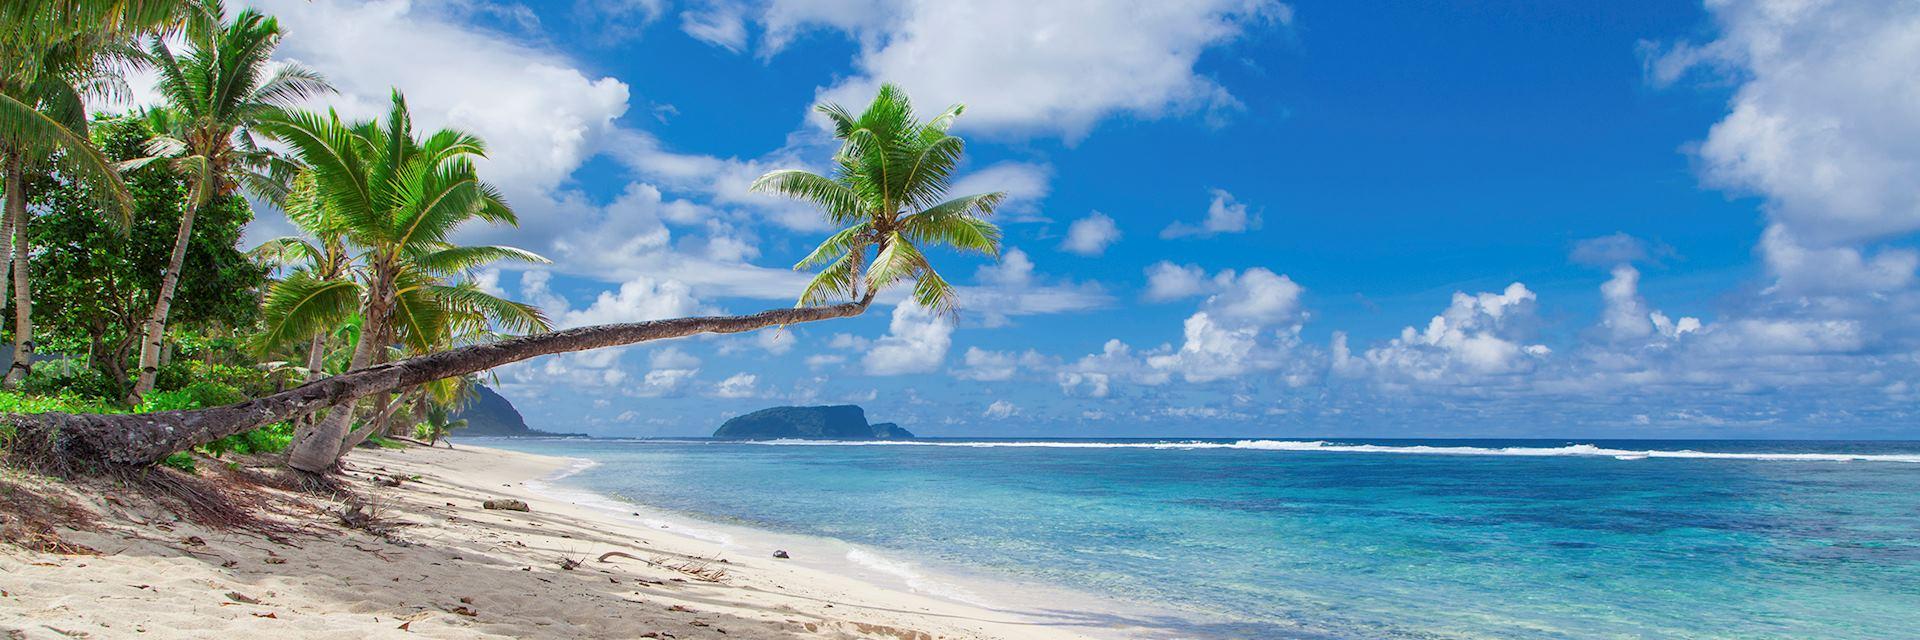 Tropical beach, Upolu